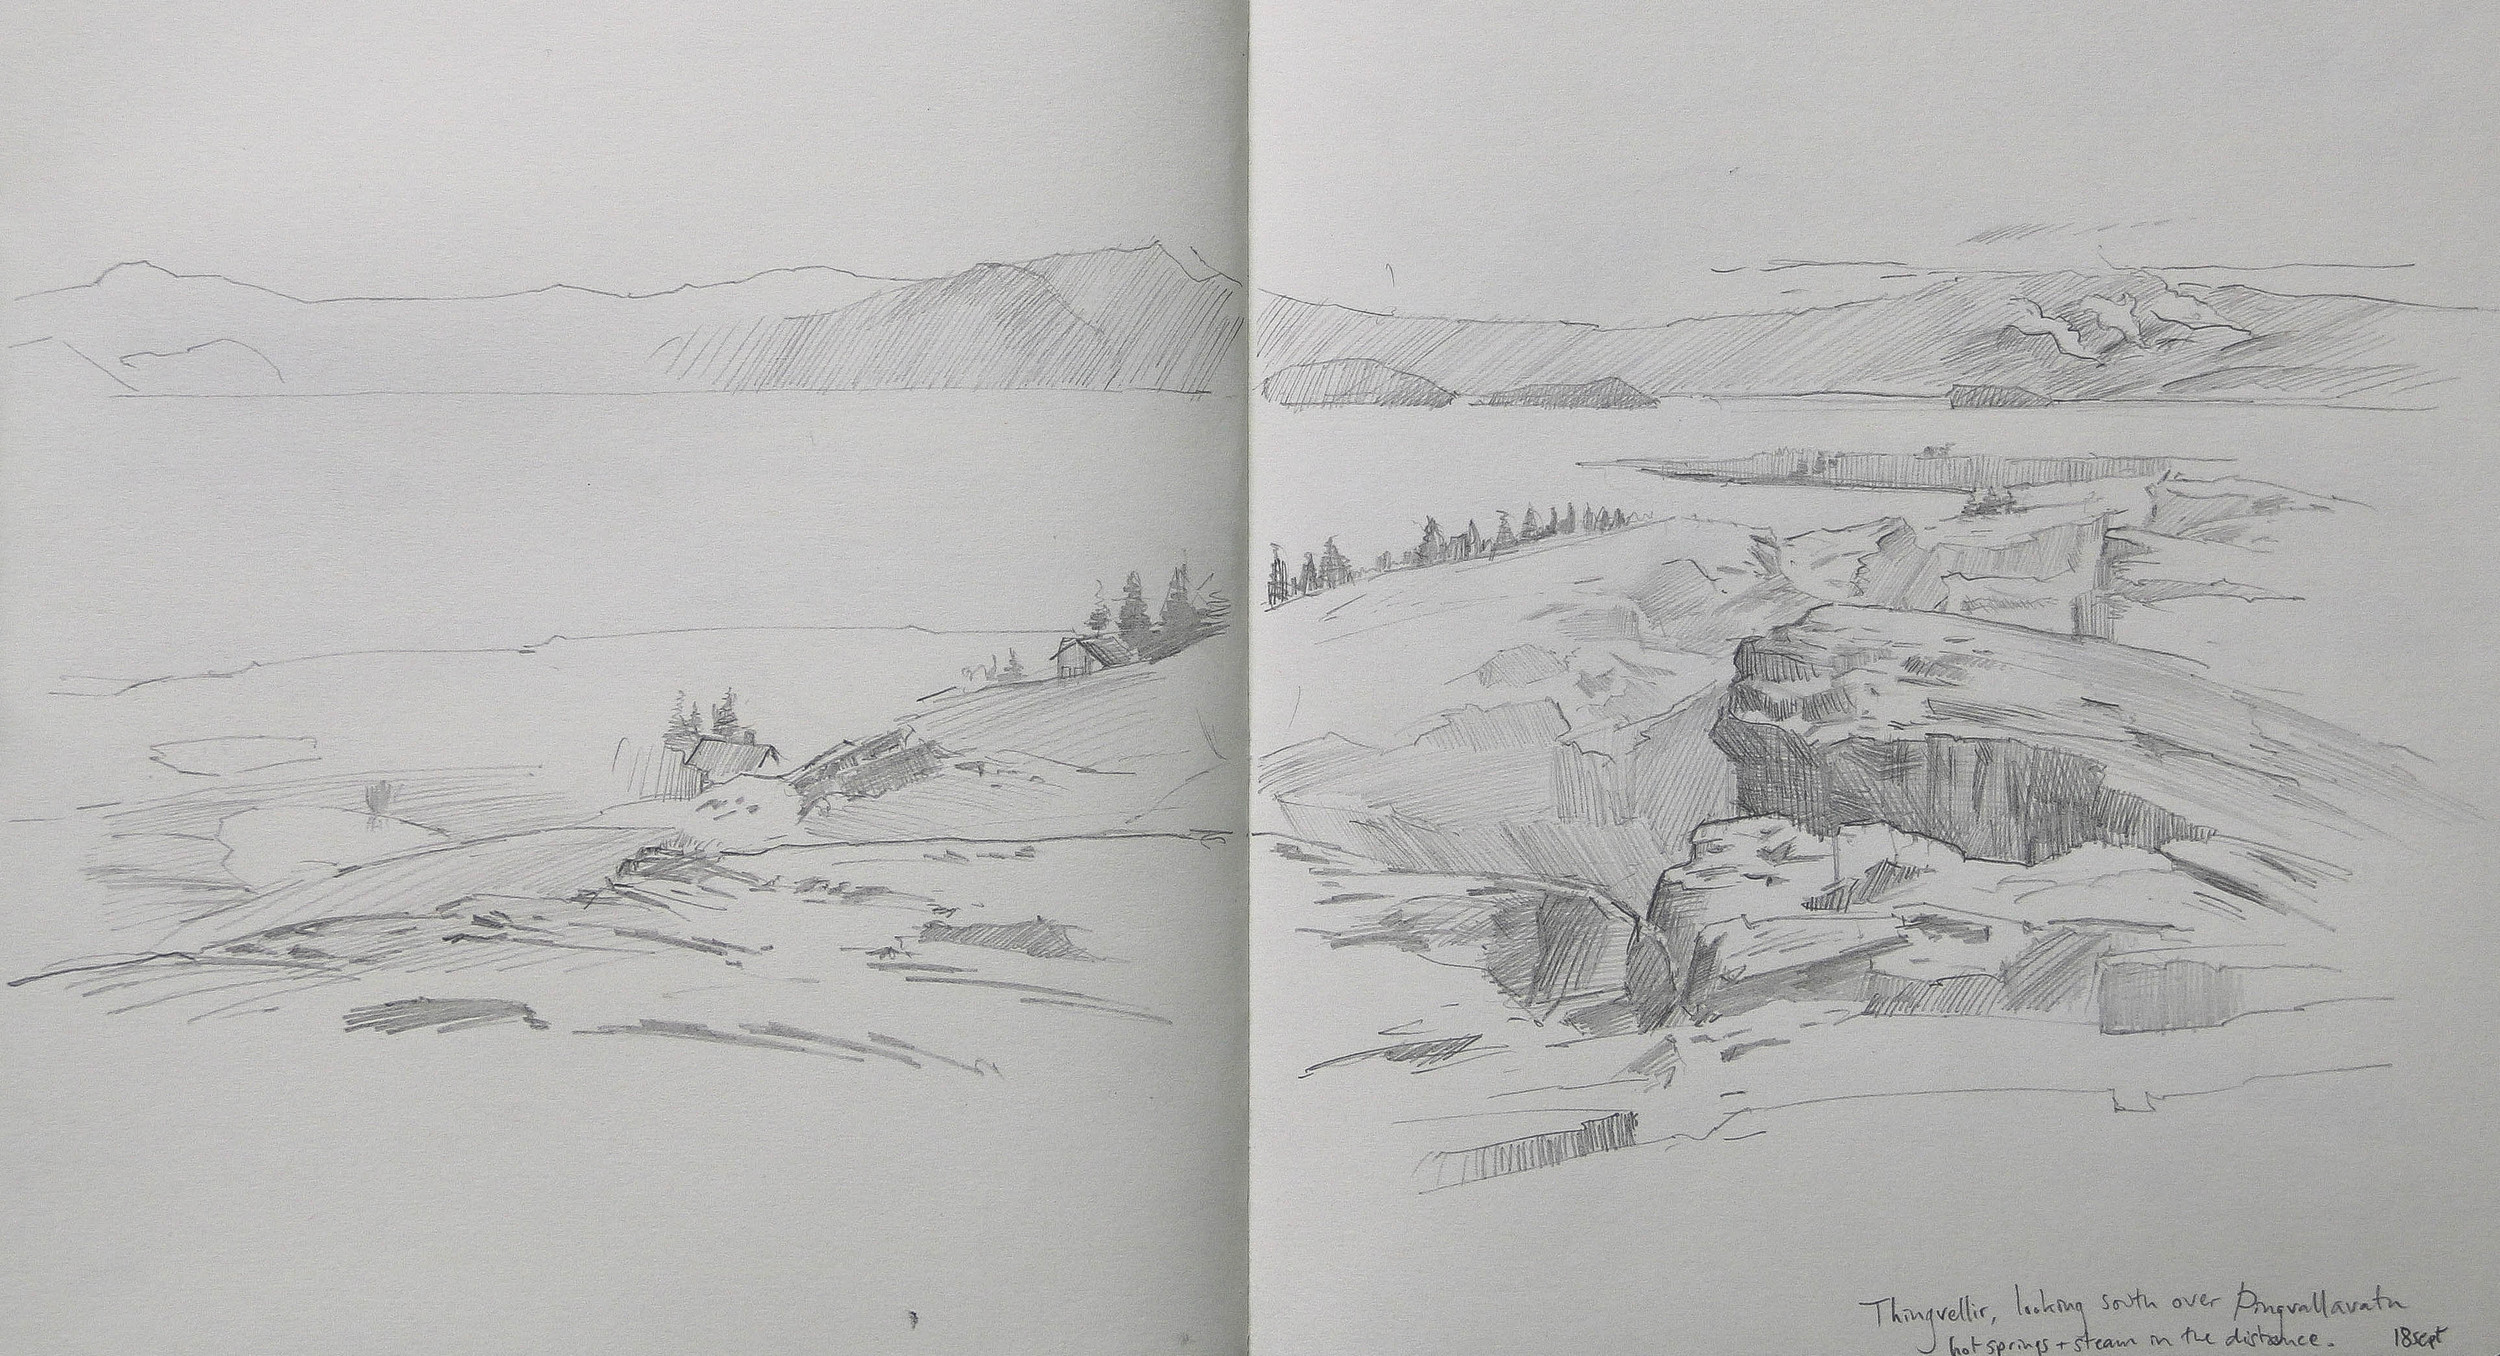 pencil sketch from Thingvellir.